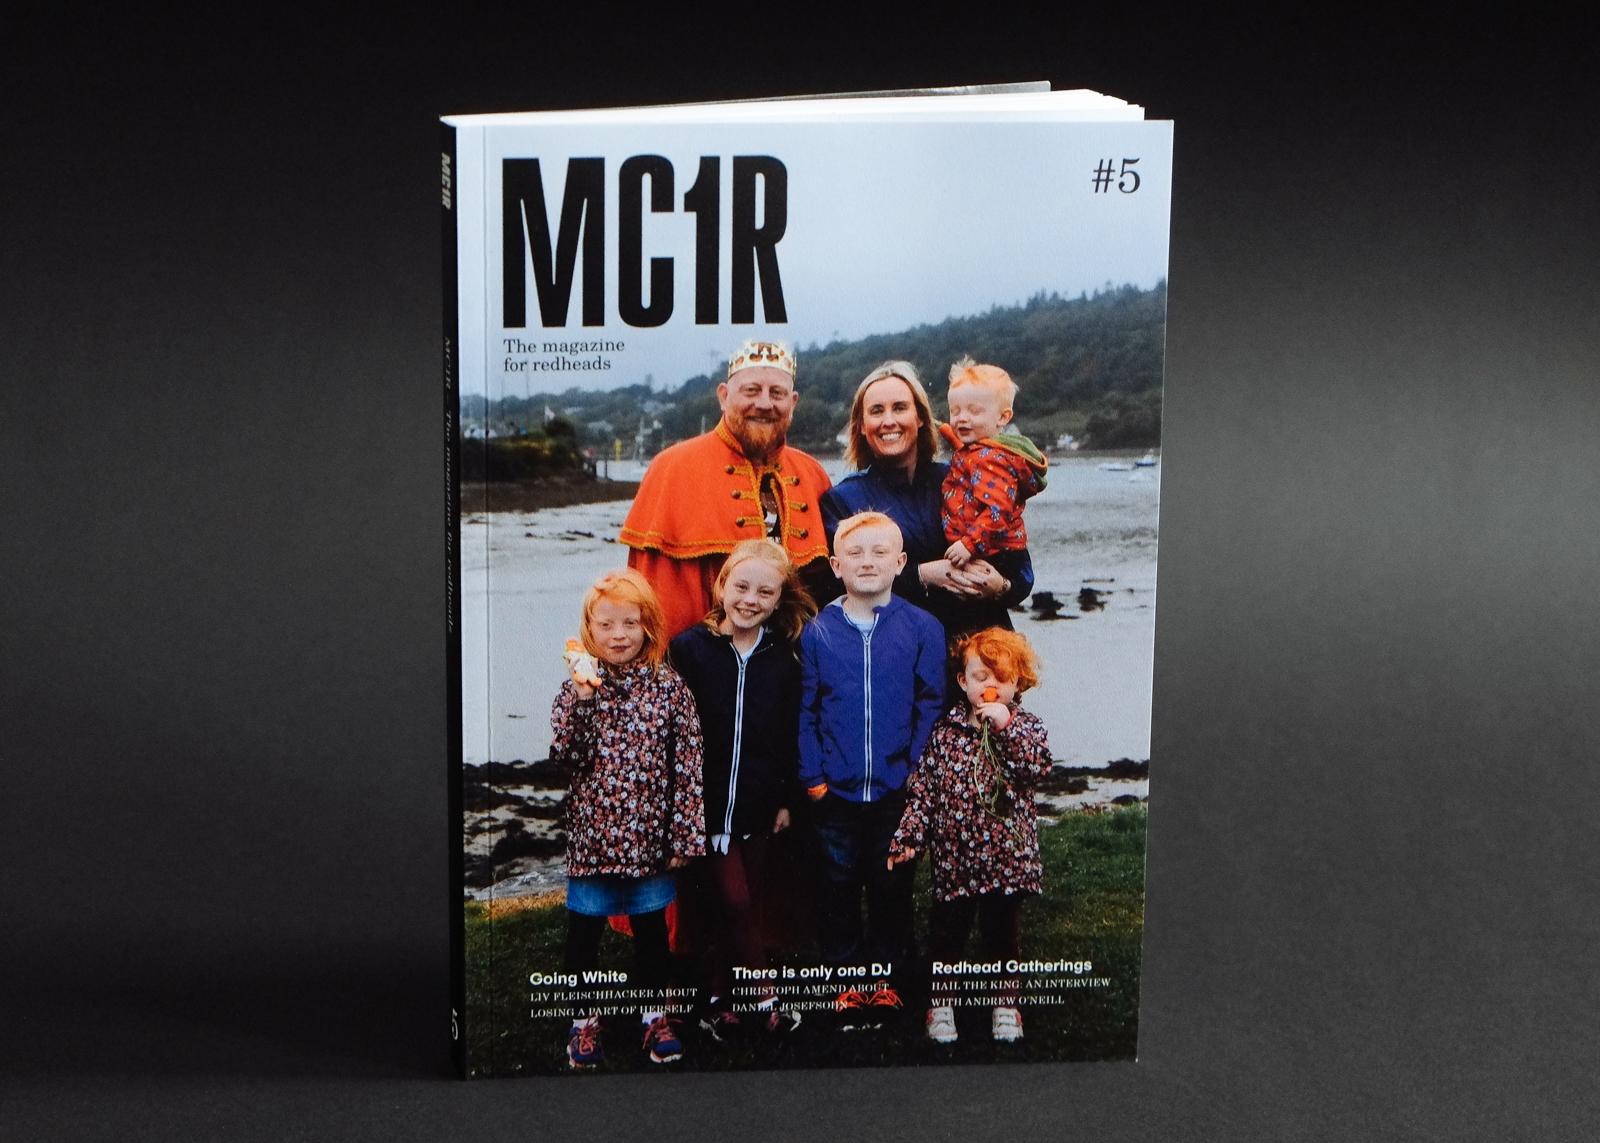 mc1r 5 1